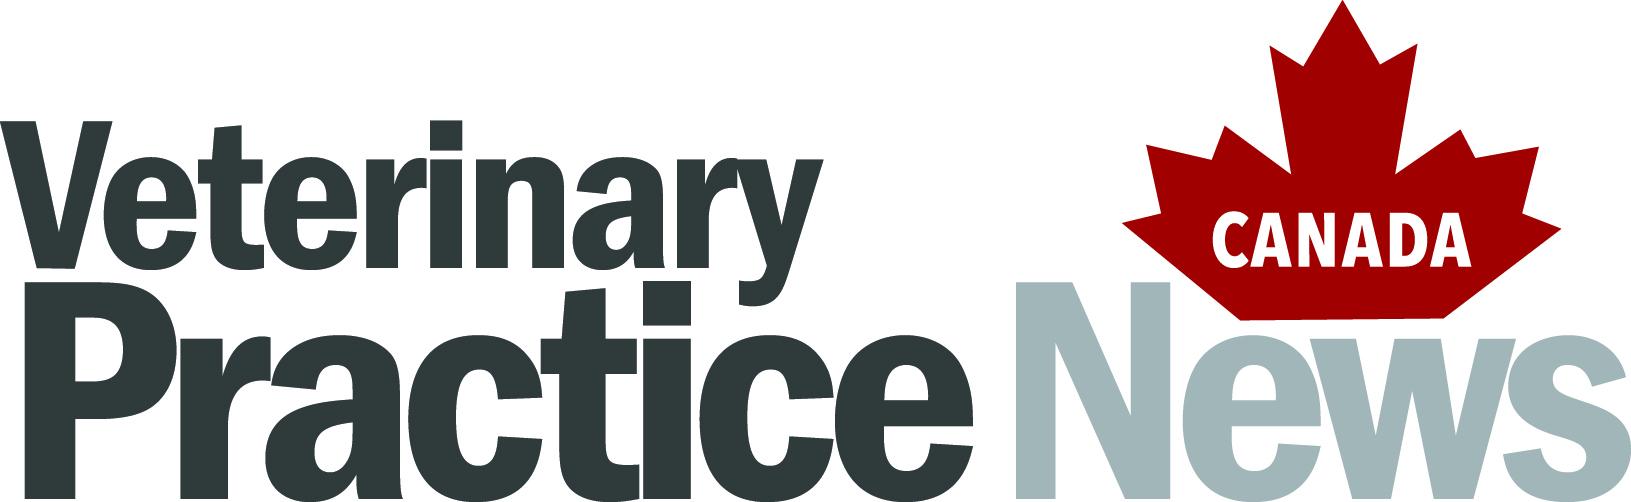 Vetrinary Practice News Canada